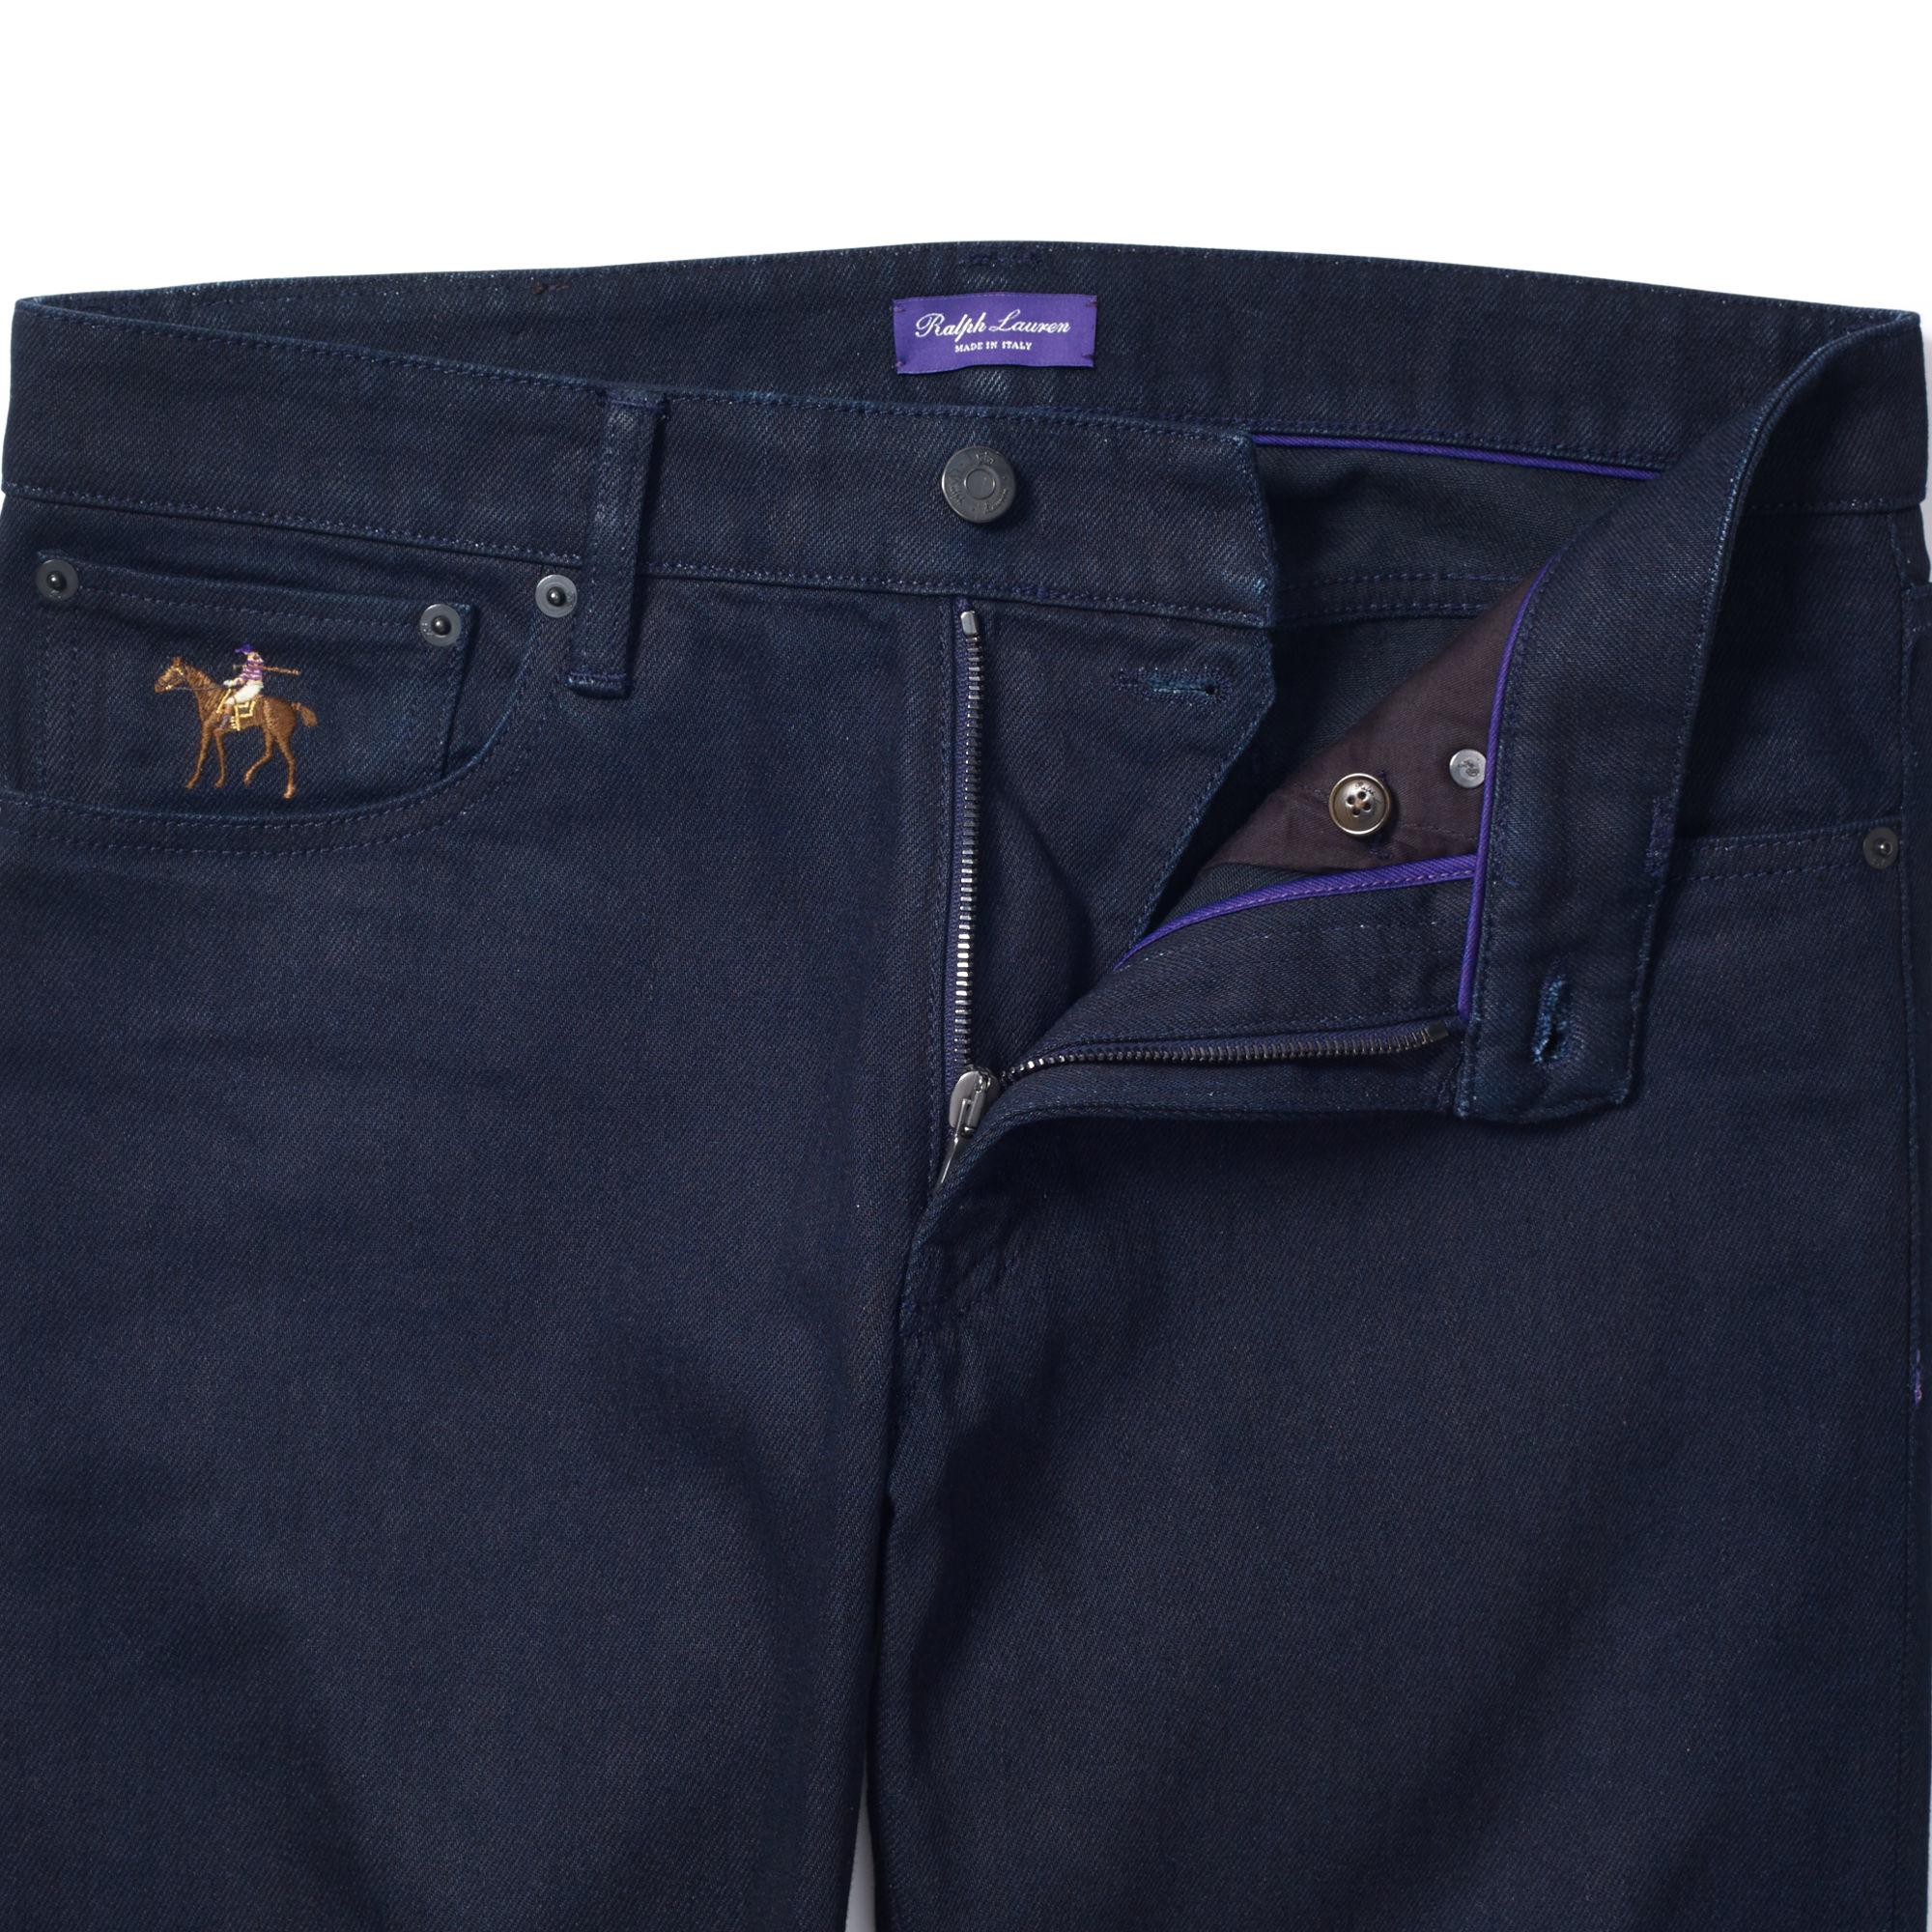 ab65cf365 Ralph Lauren Purple Label Slim-fit Stretch Jean in Blue for Men - Lyst